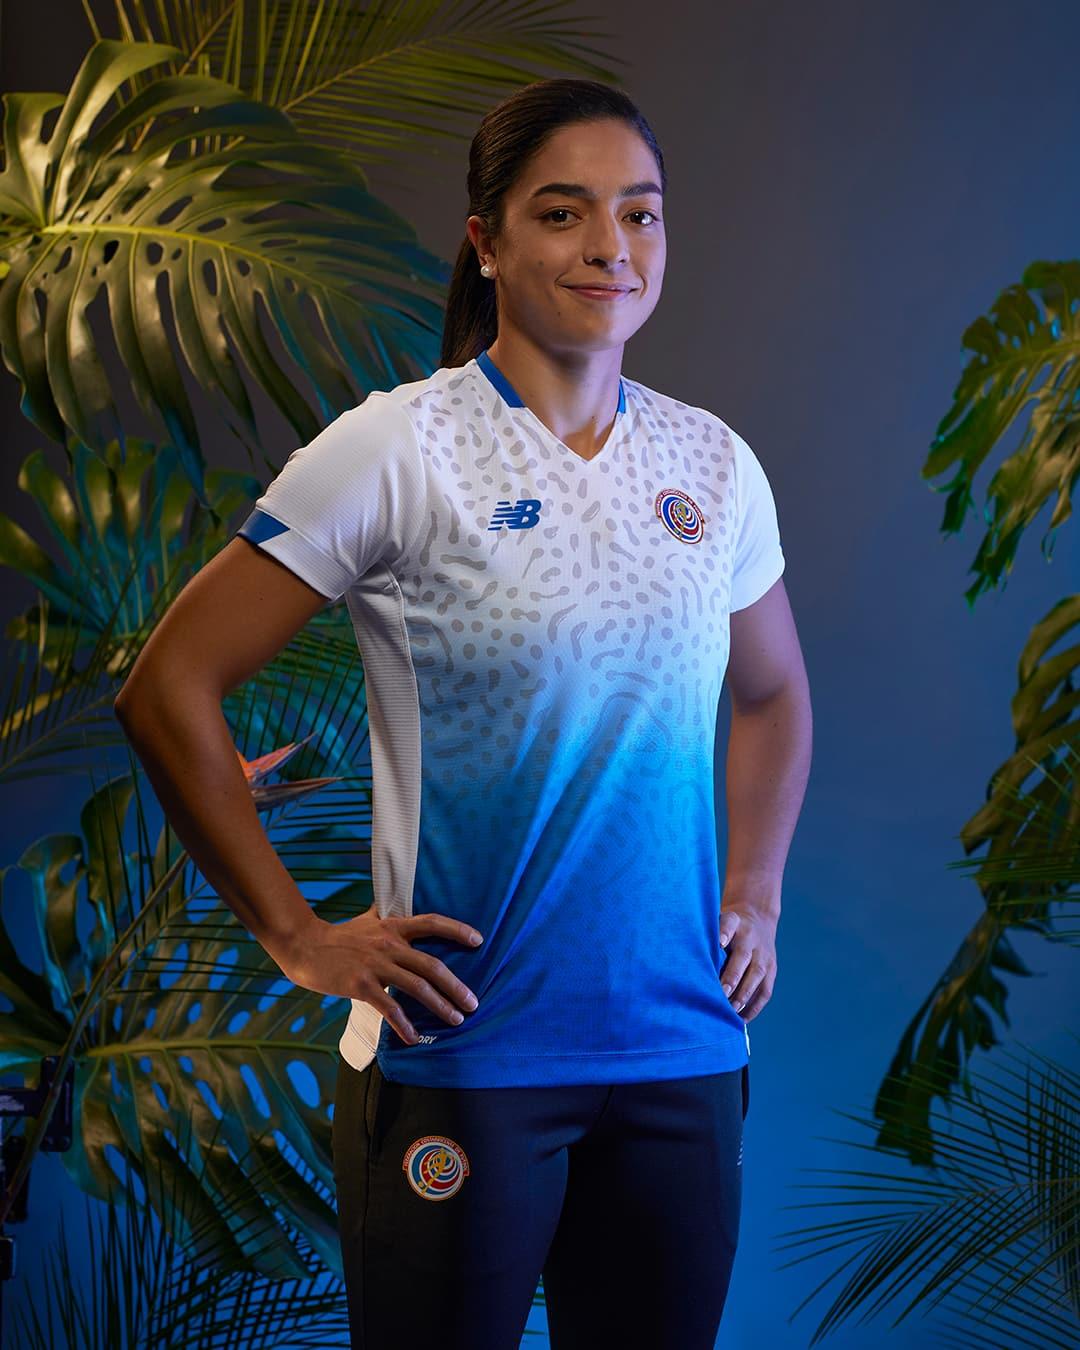 maillot-exterieur-costa-rica-2021-new-balance-2